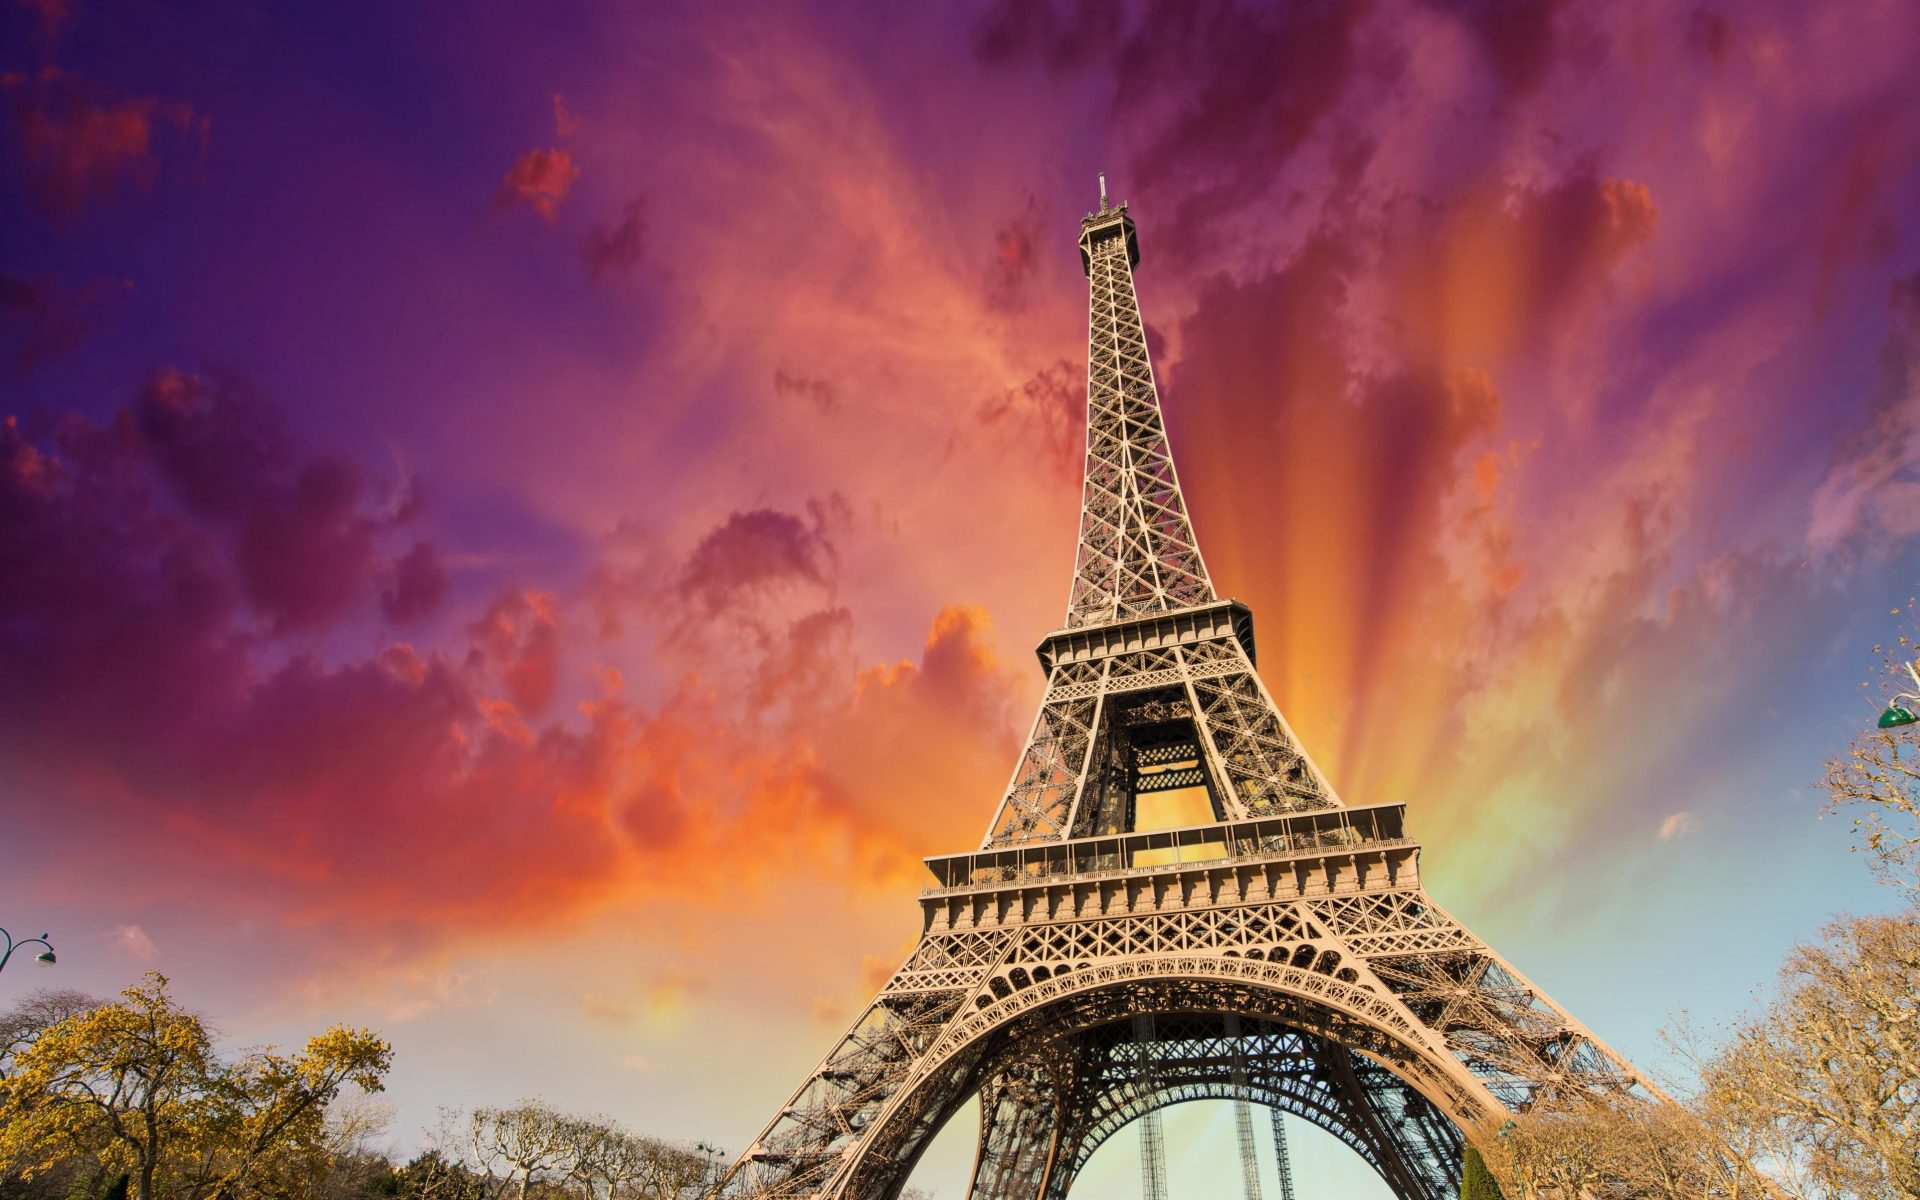 Eiffel Tower Sunset Orange Red Pink Sky 4K Wallpaper